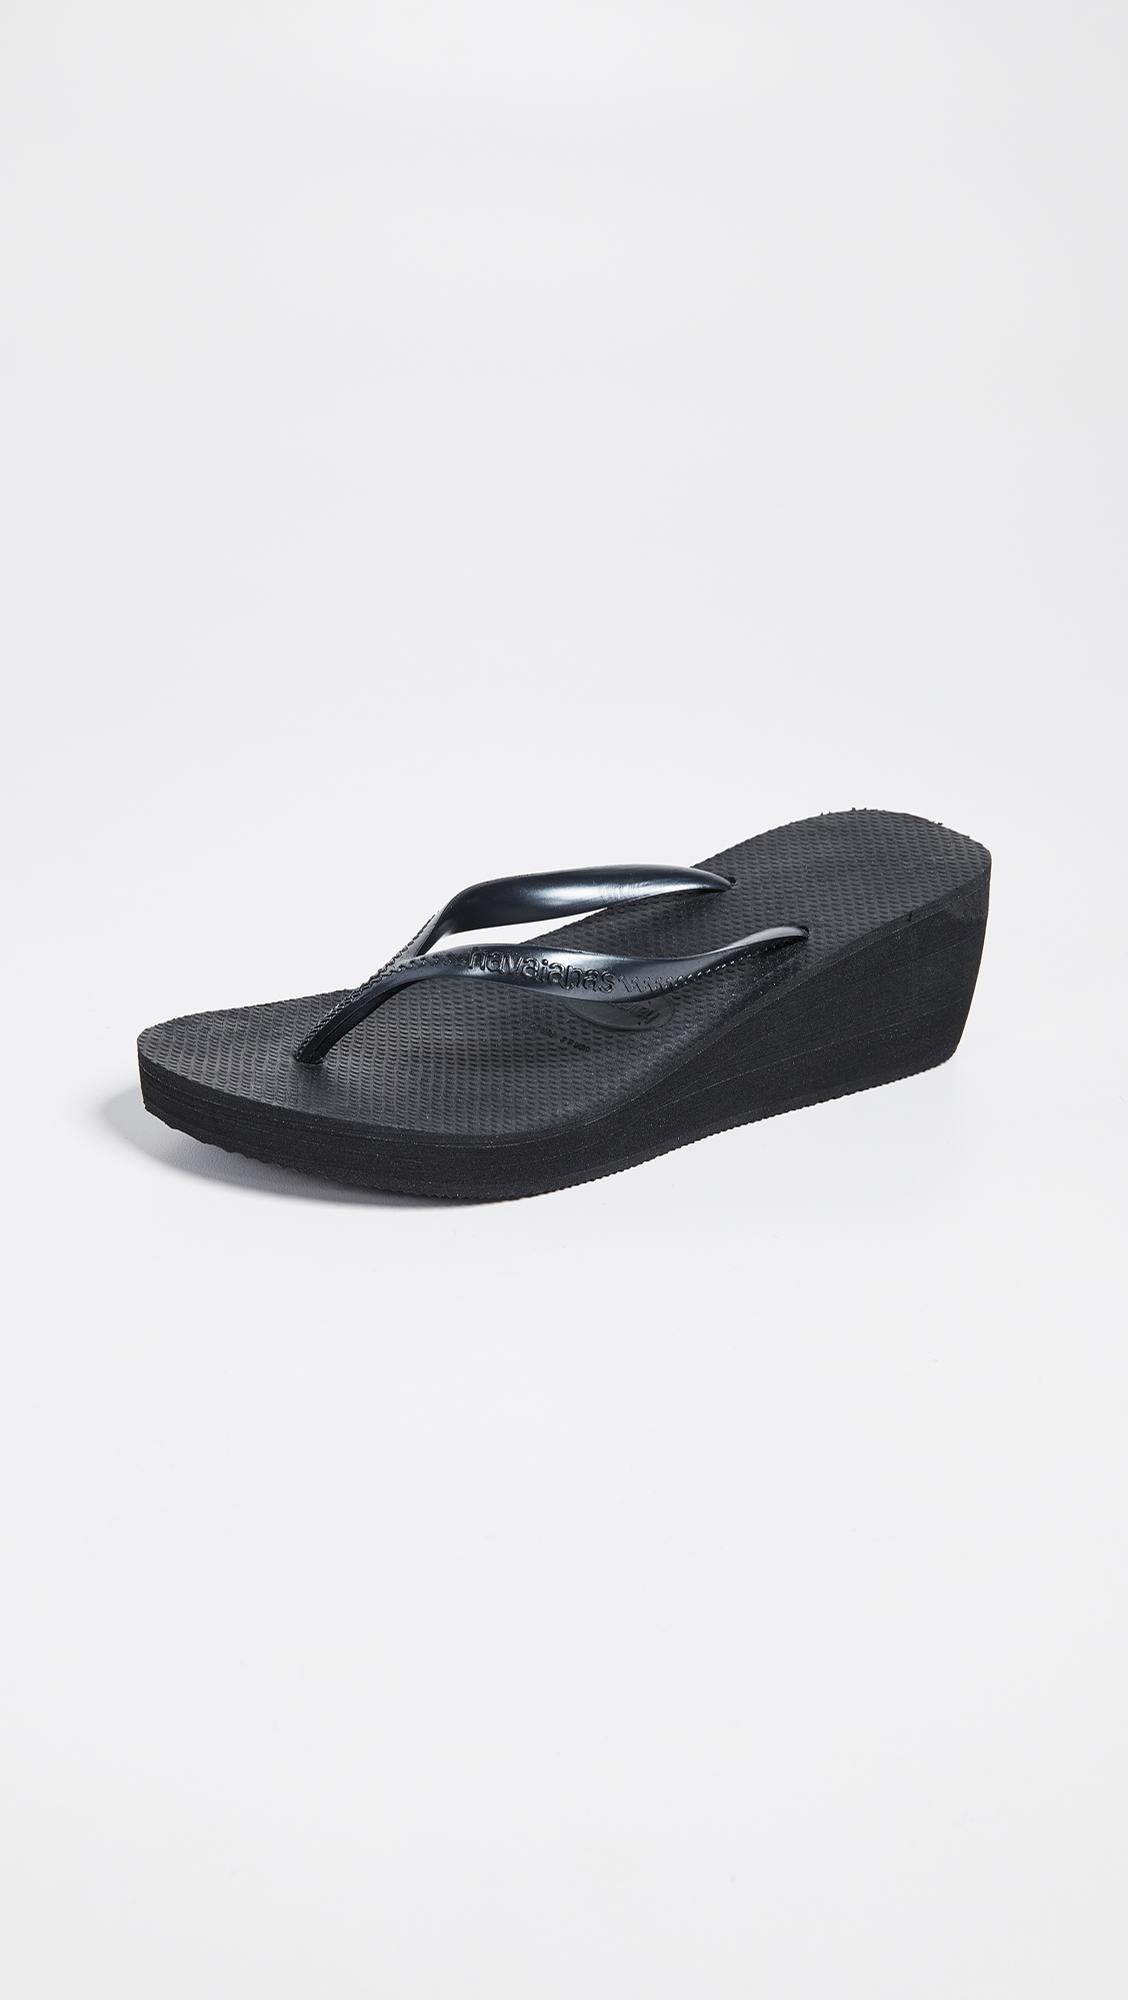 c24e0203acb605 Havaianas High Fashion Wedge Flip Flops